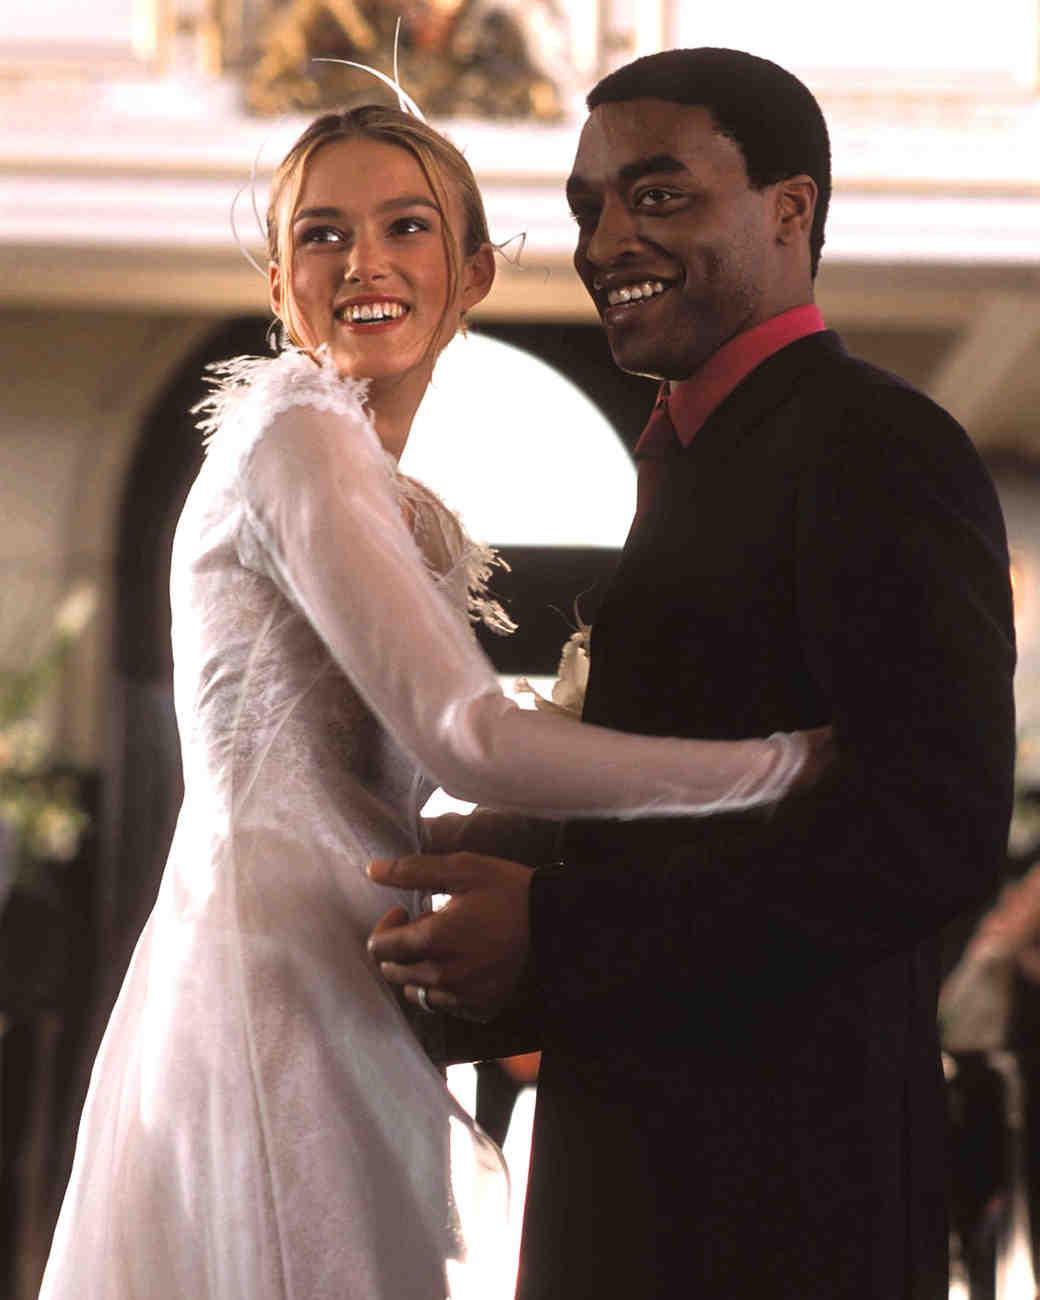 movie-wedding-dresses-love-actually-keira-knightley-0316.jpg